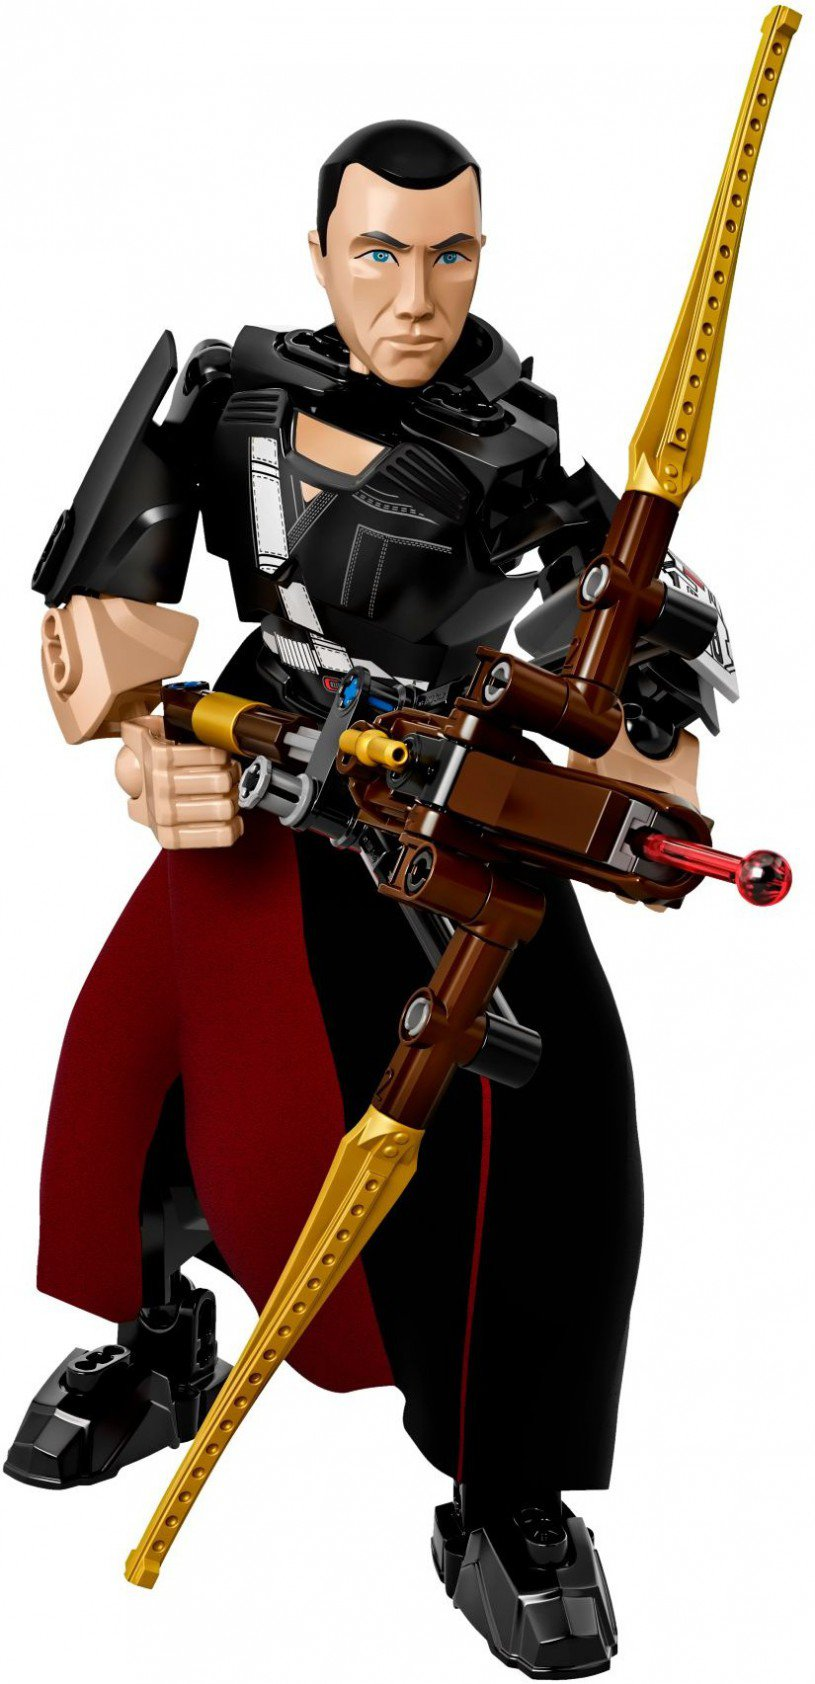 LEGO 75524 Star Wars: Chirrut Îmwe